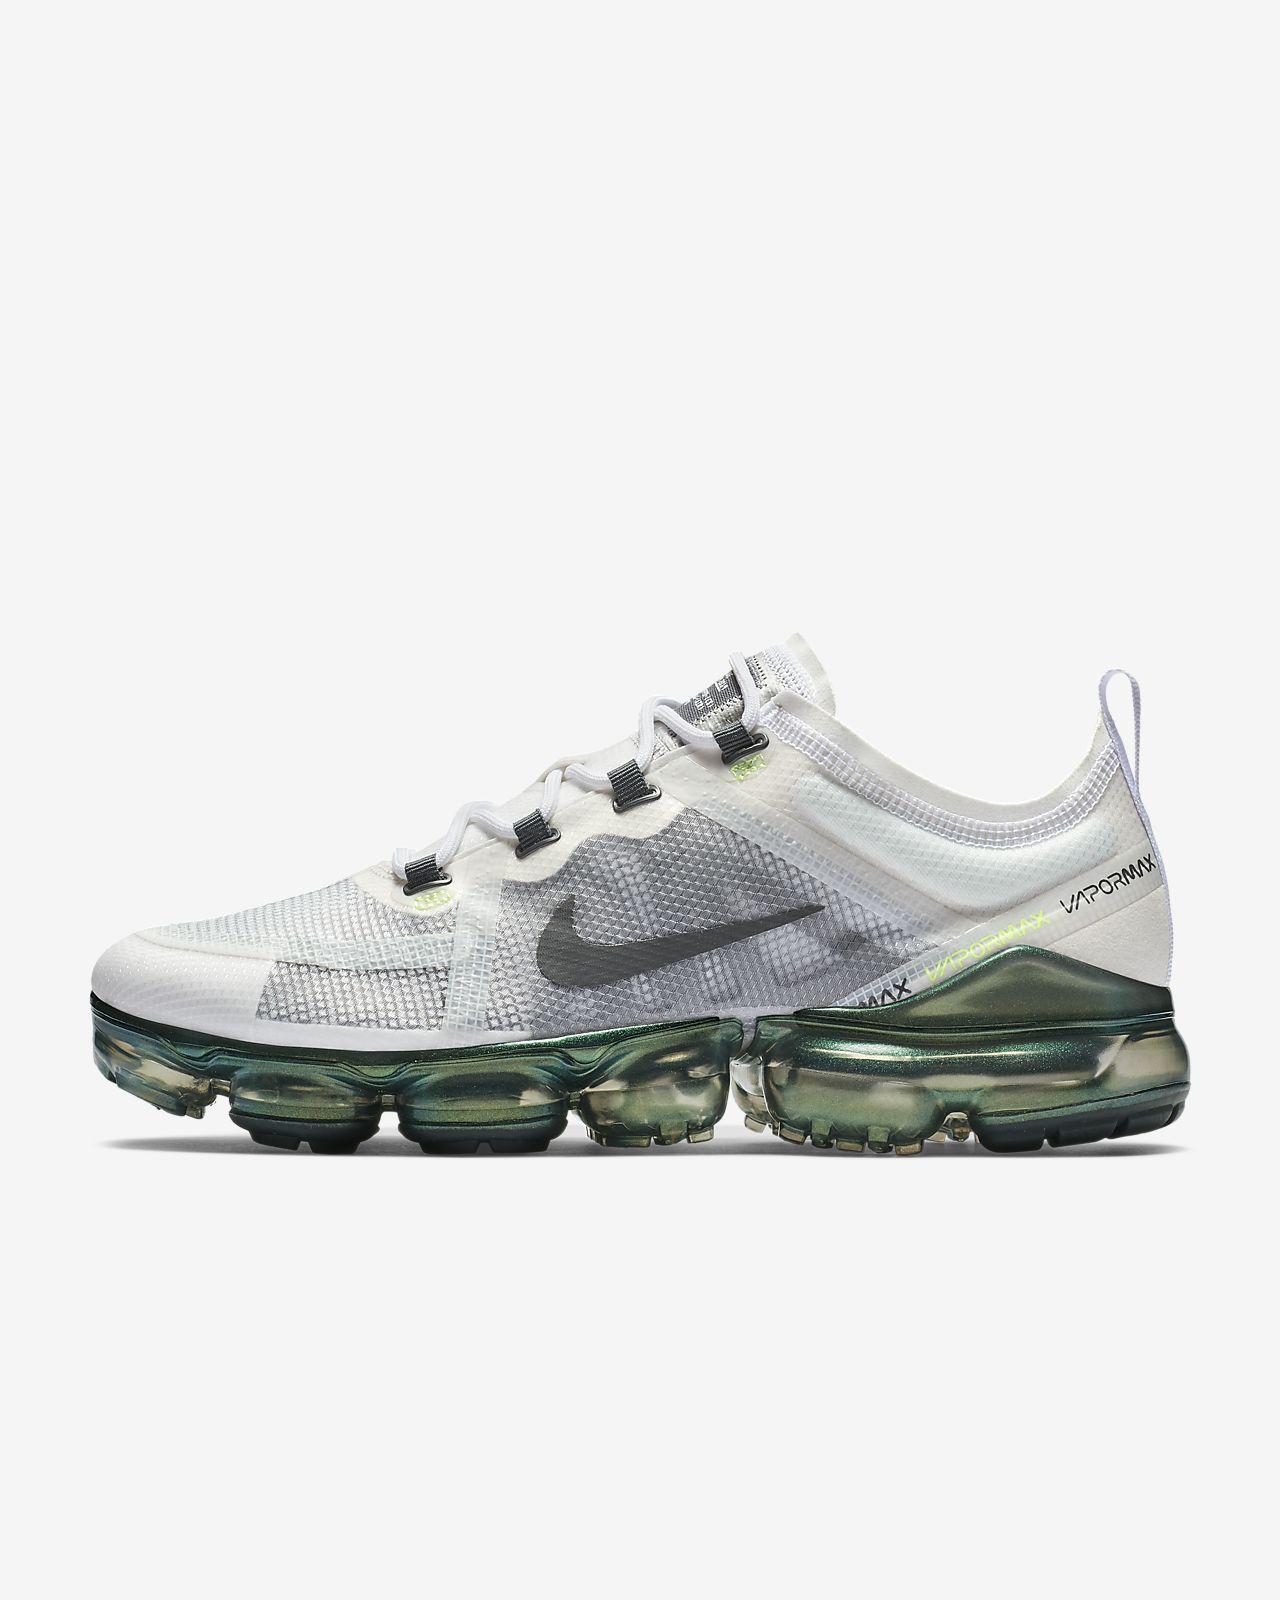 super popular 0cda2 7066d ... Calzado Nike Air VaporMax 2019 Premium